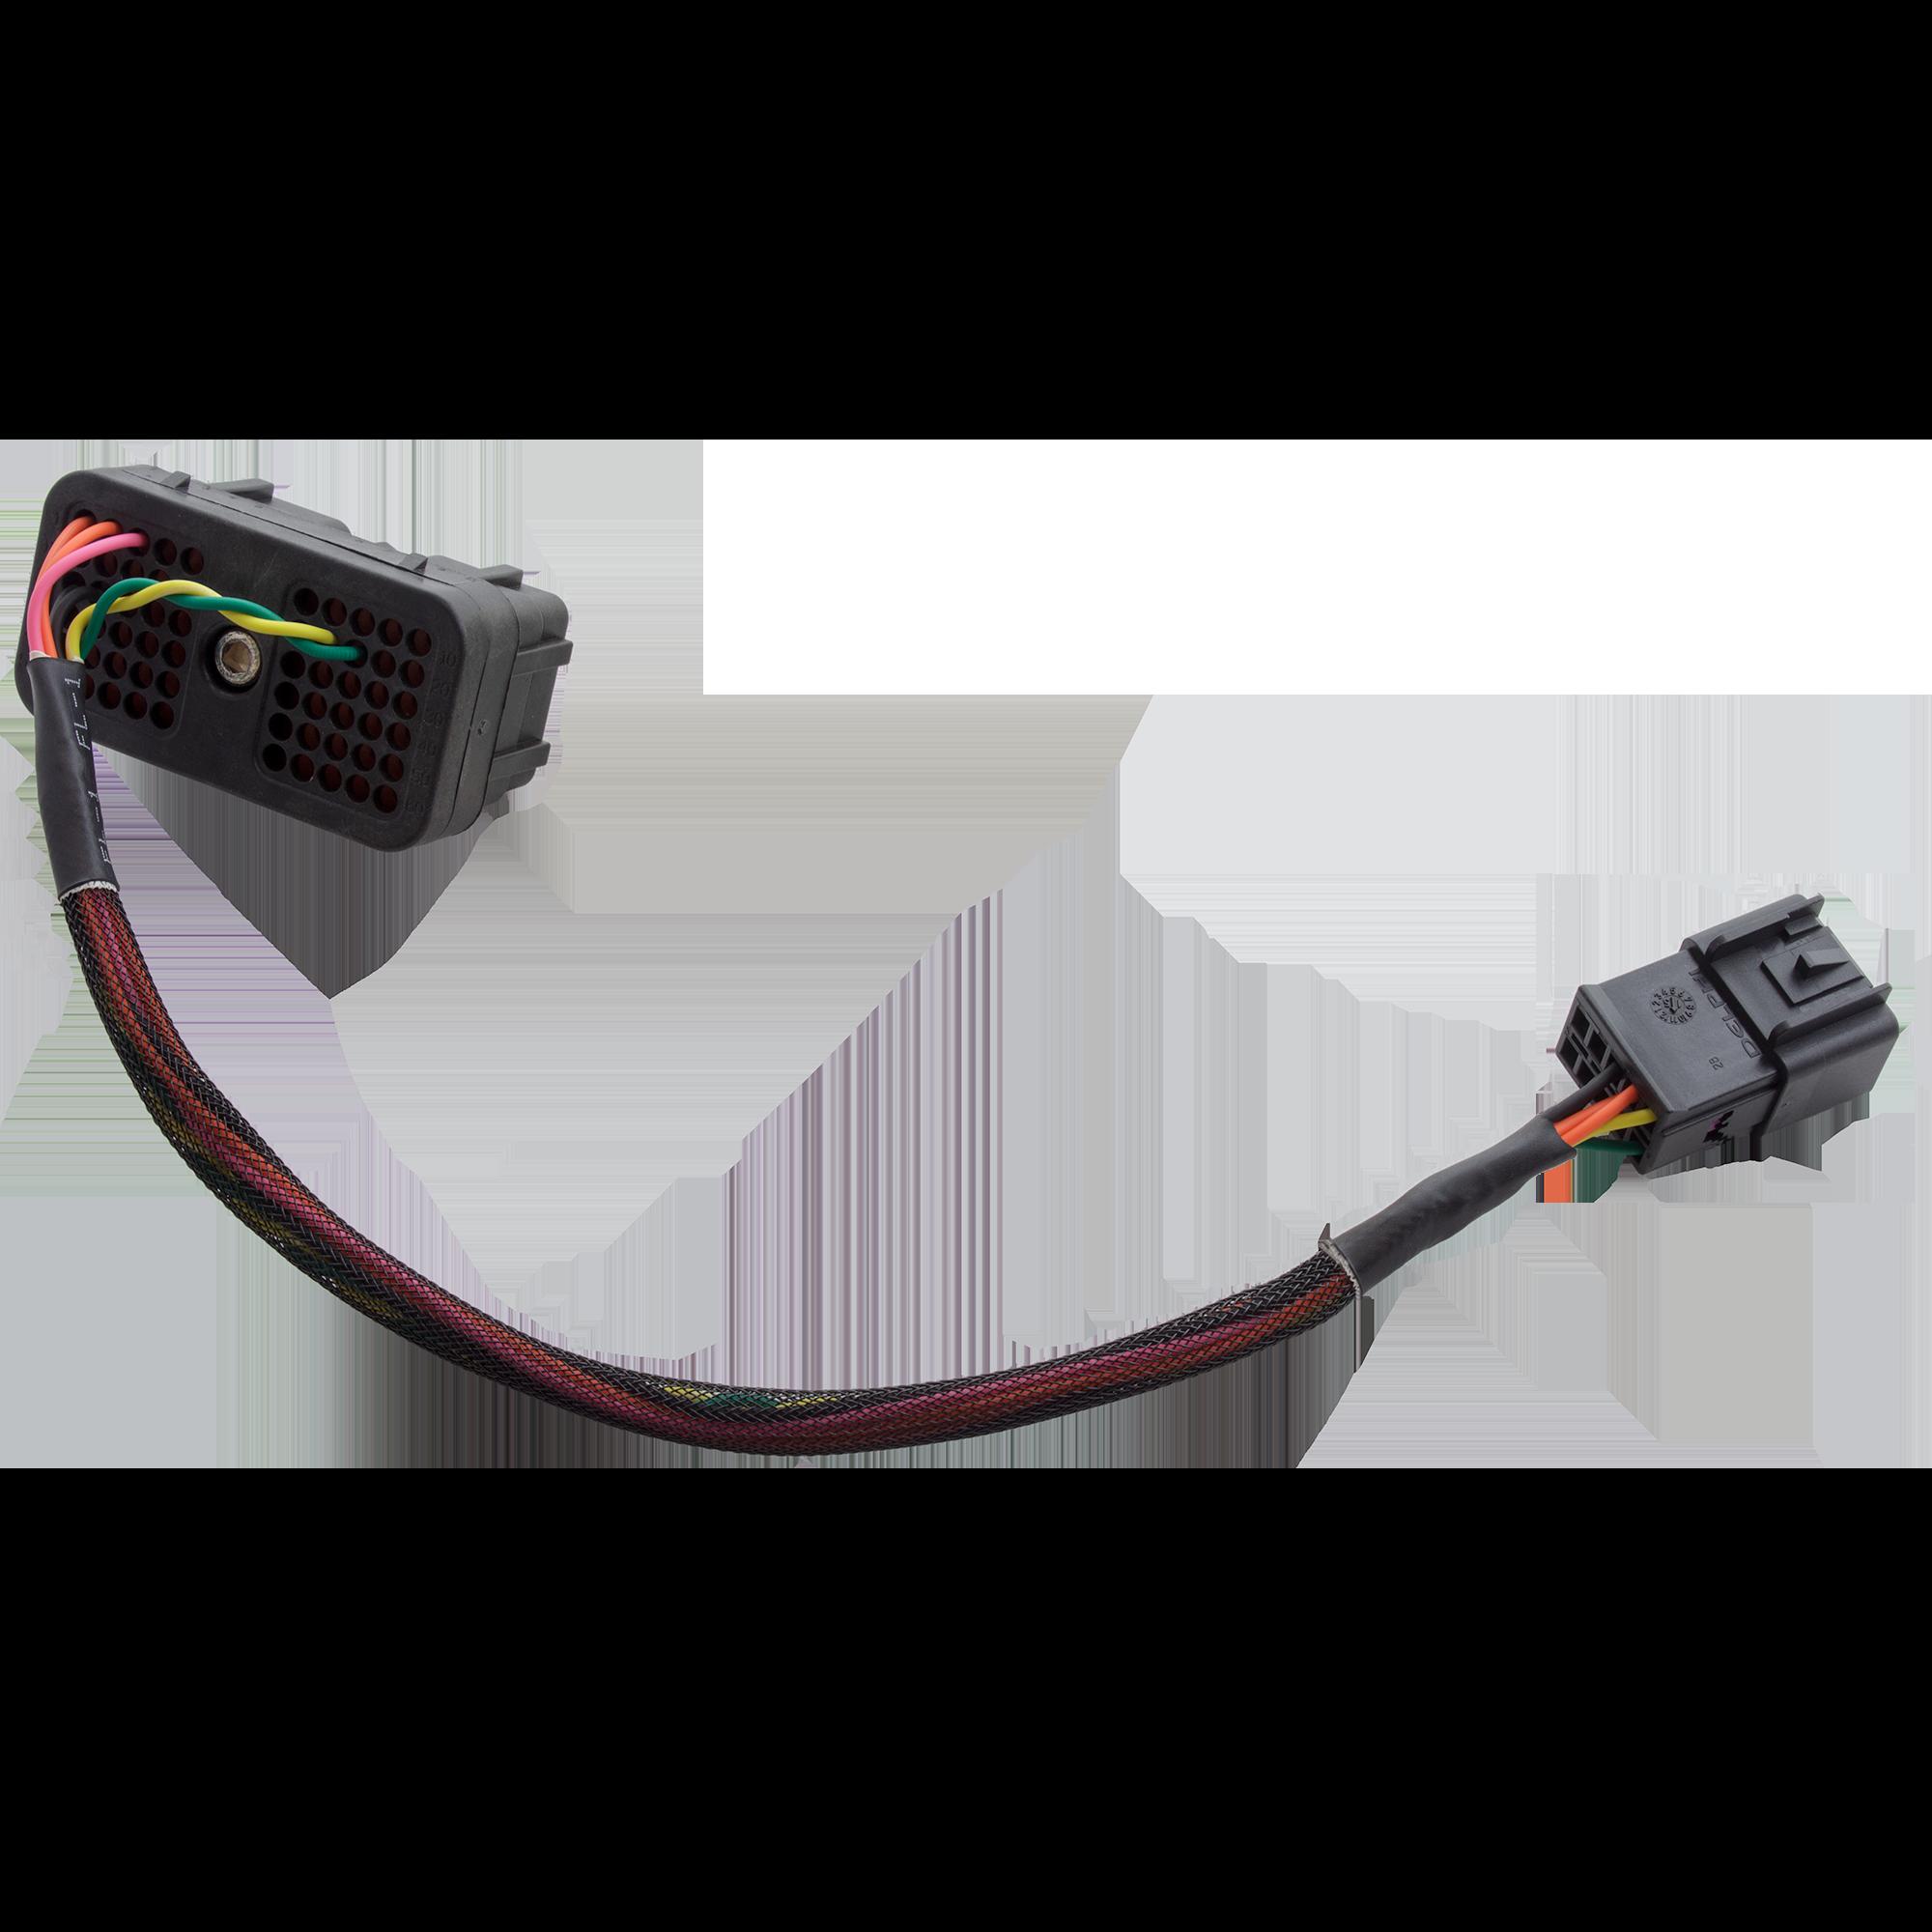 Peachy Cummins Wiring Harness Repair Kit Basic Electronics Wiring Diagram Wiring Cloud Hisonuggs Outletorg